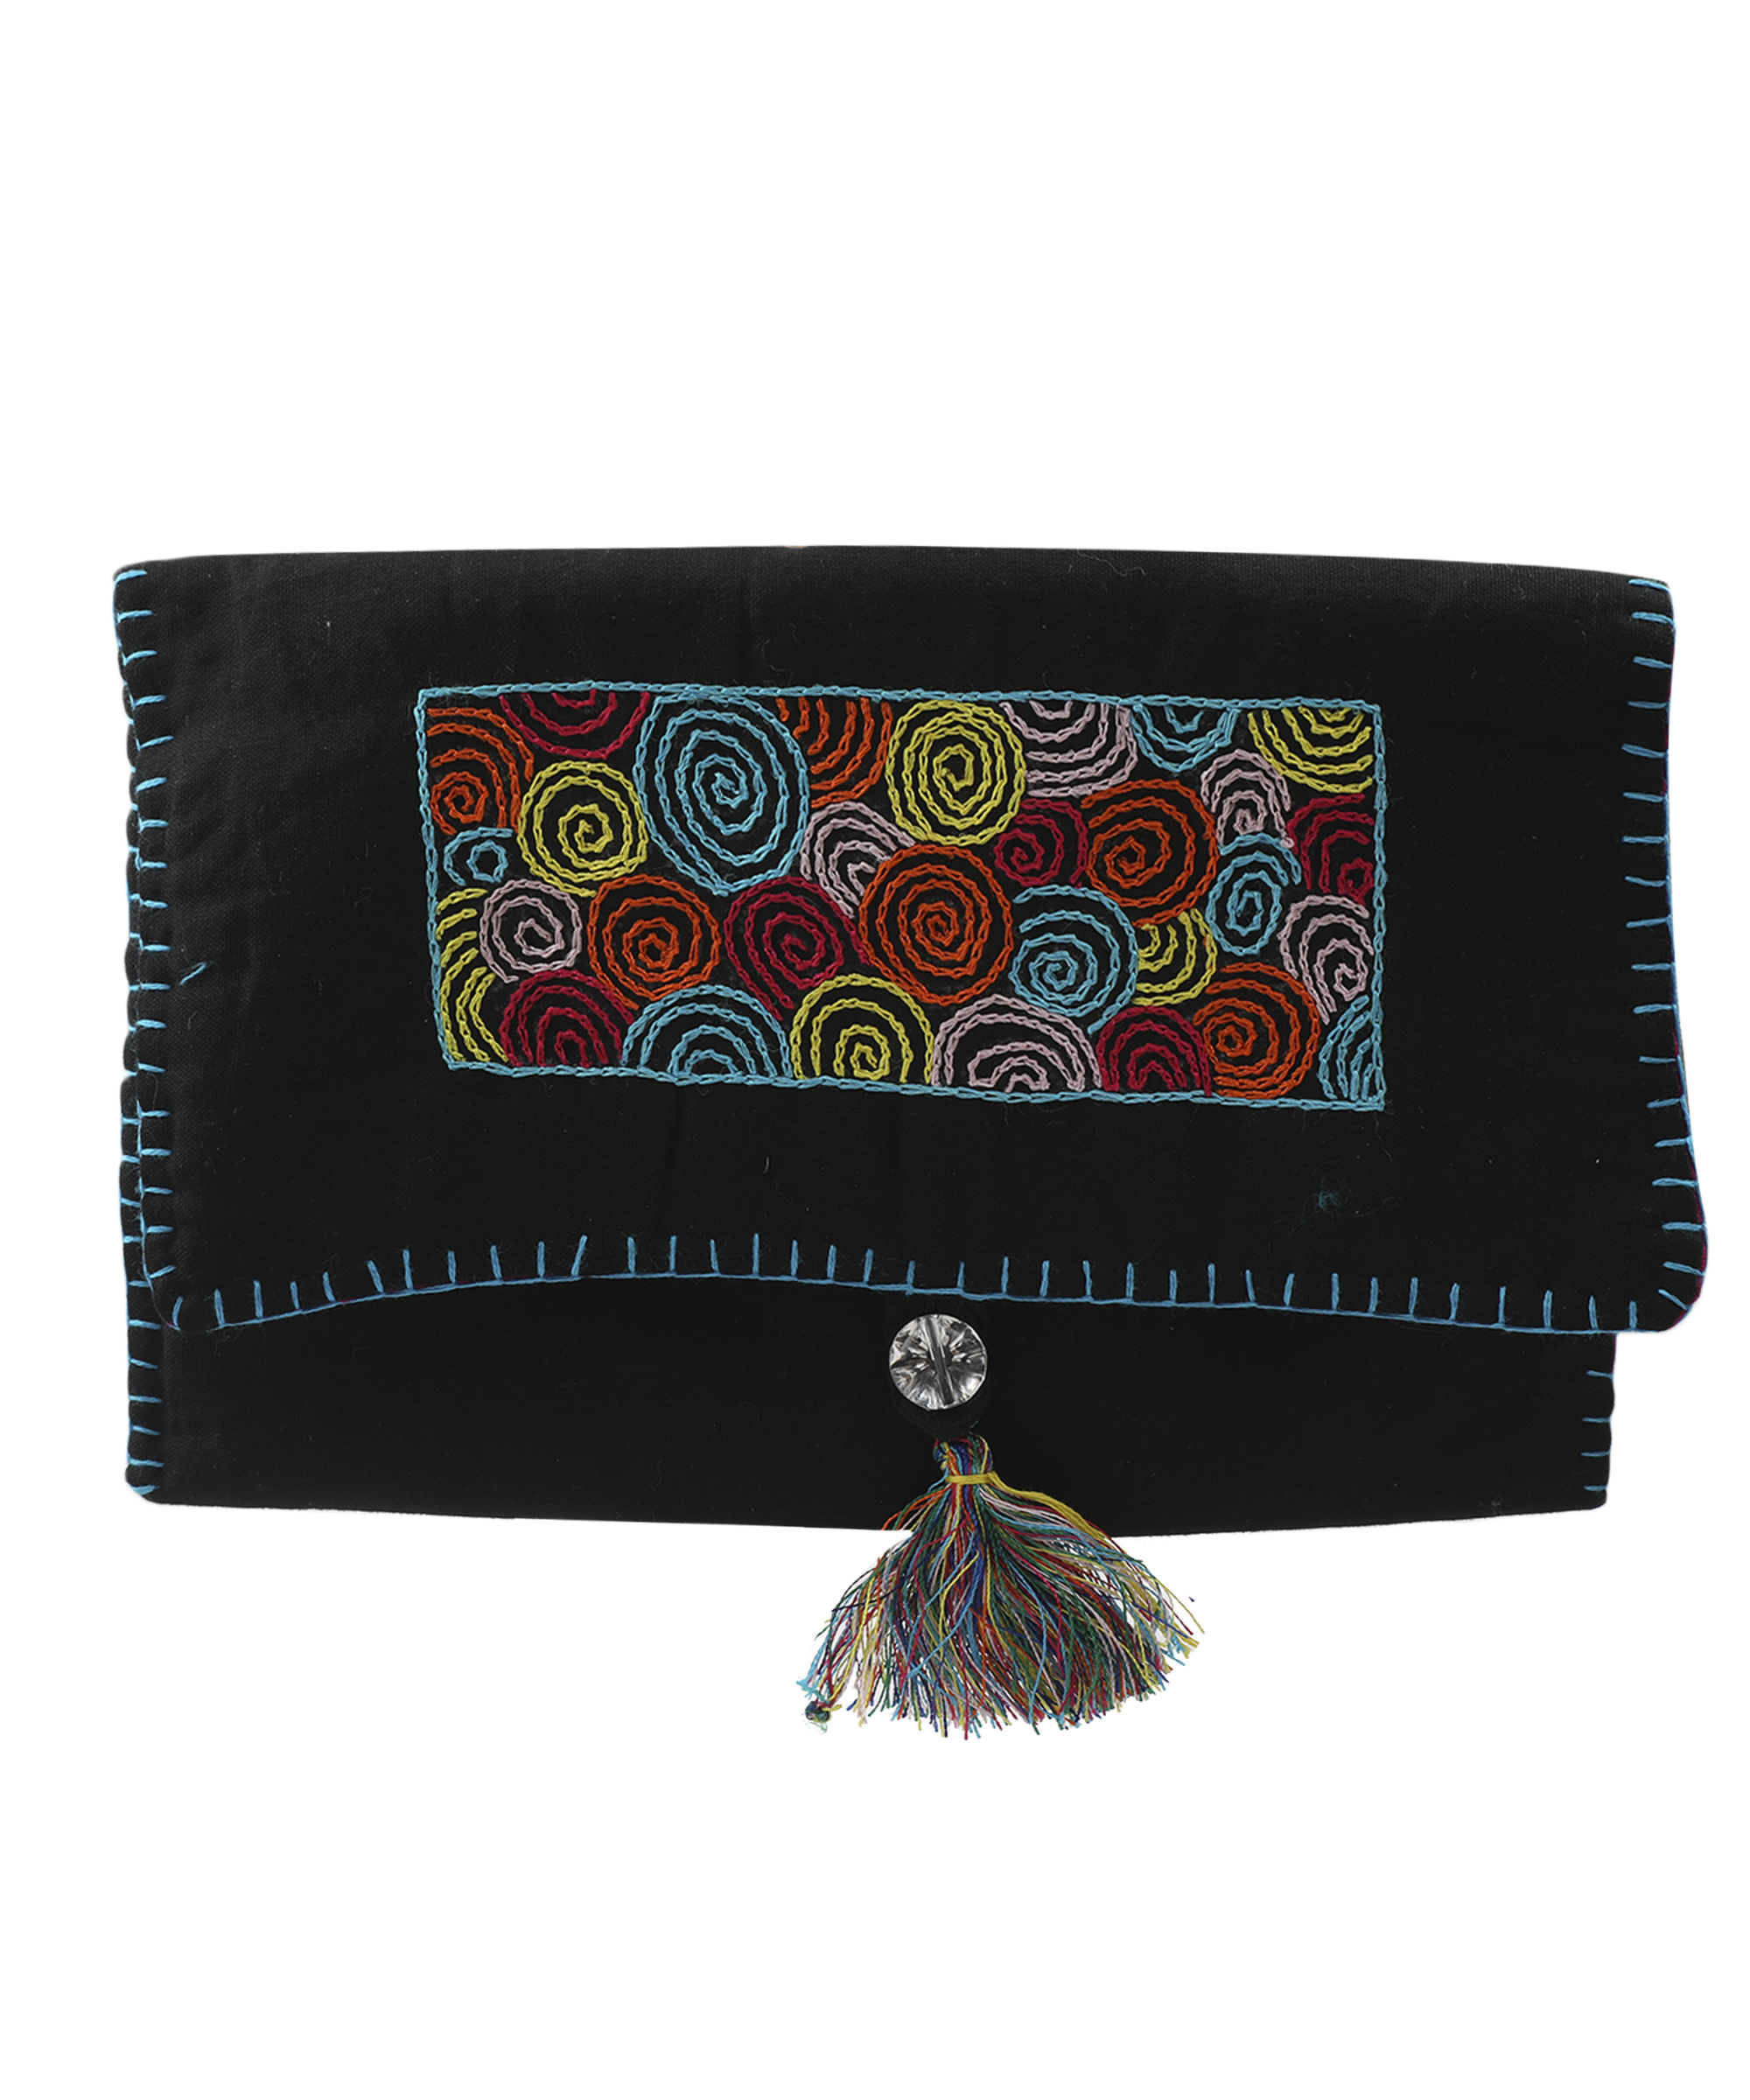 Women's Embroidered Clutch, Poplin Cotton Fabric (Spiral - Black) Slider Thumbnail 2/4